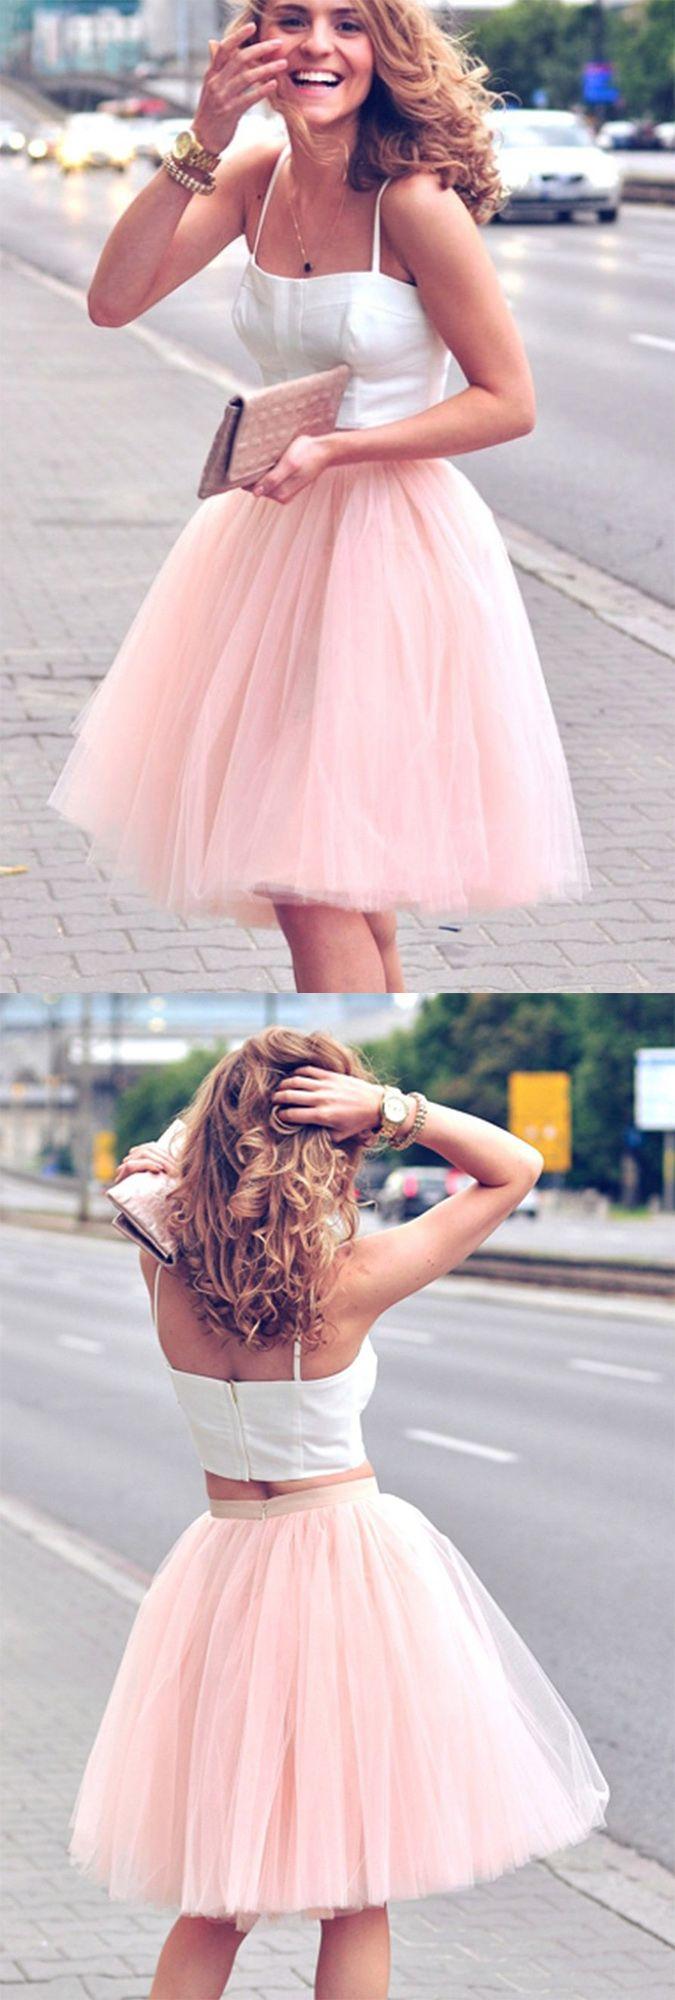 Mejores 73 imágenes de Homecoming Dresses en Pinterest | Vestido de ...